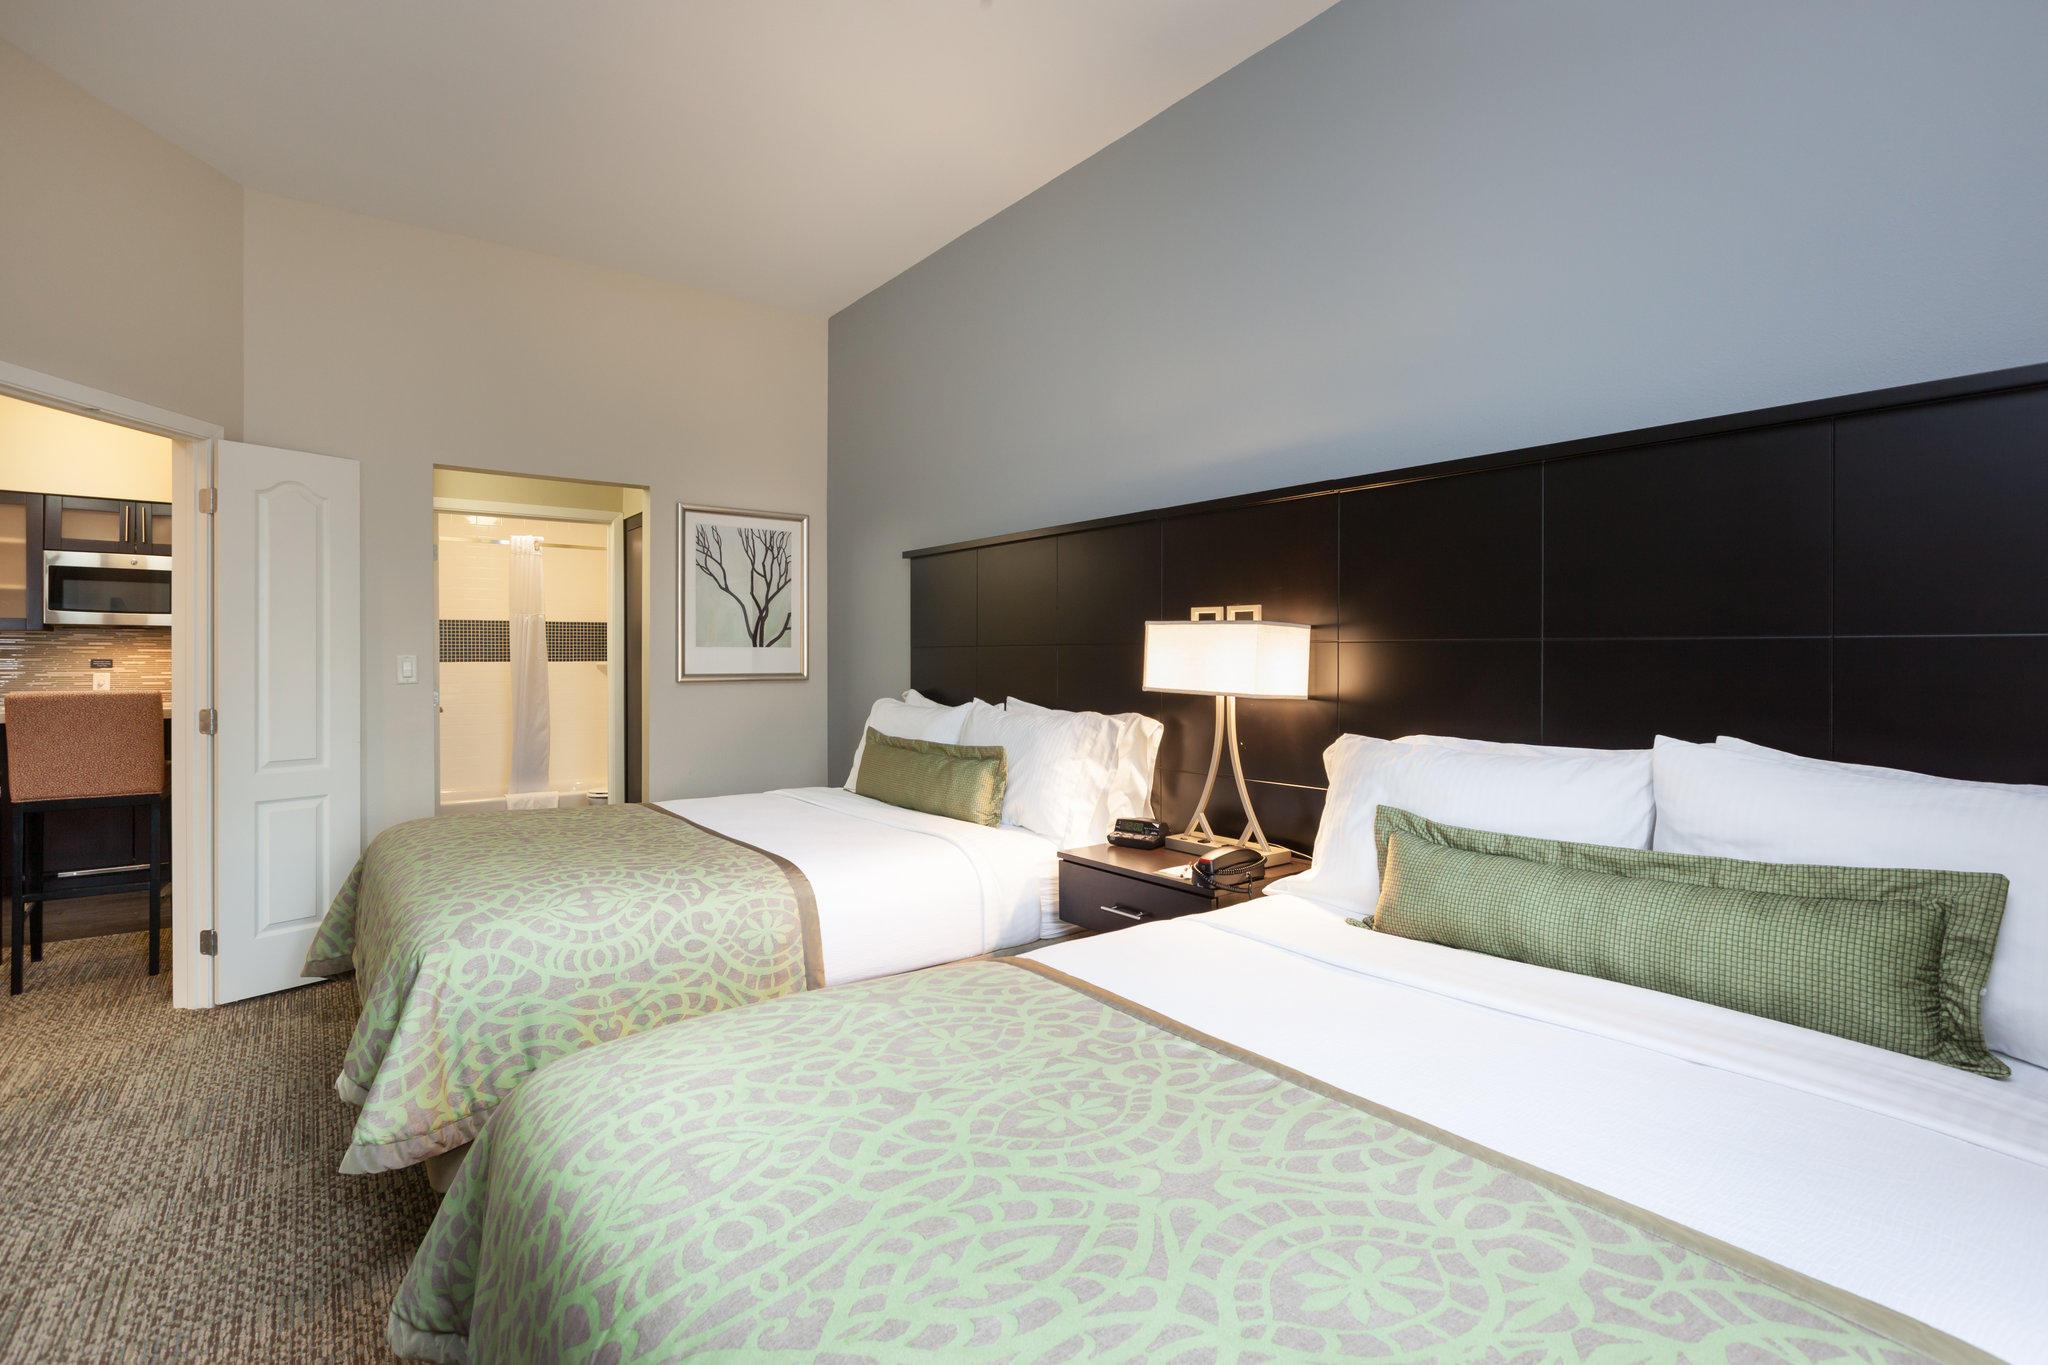 Staybridge Suites Houston I-10 West-Beltway 8, an IHG Hotel